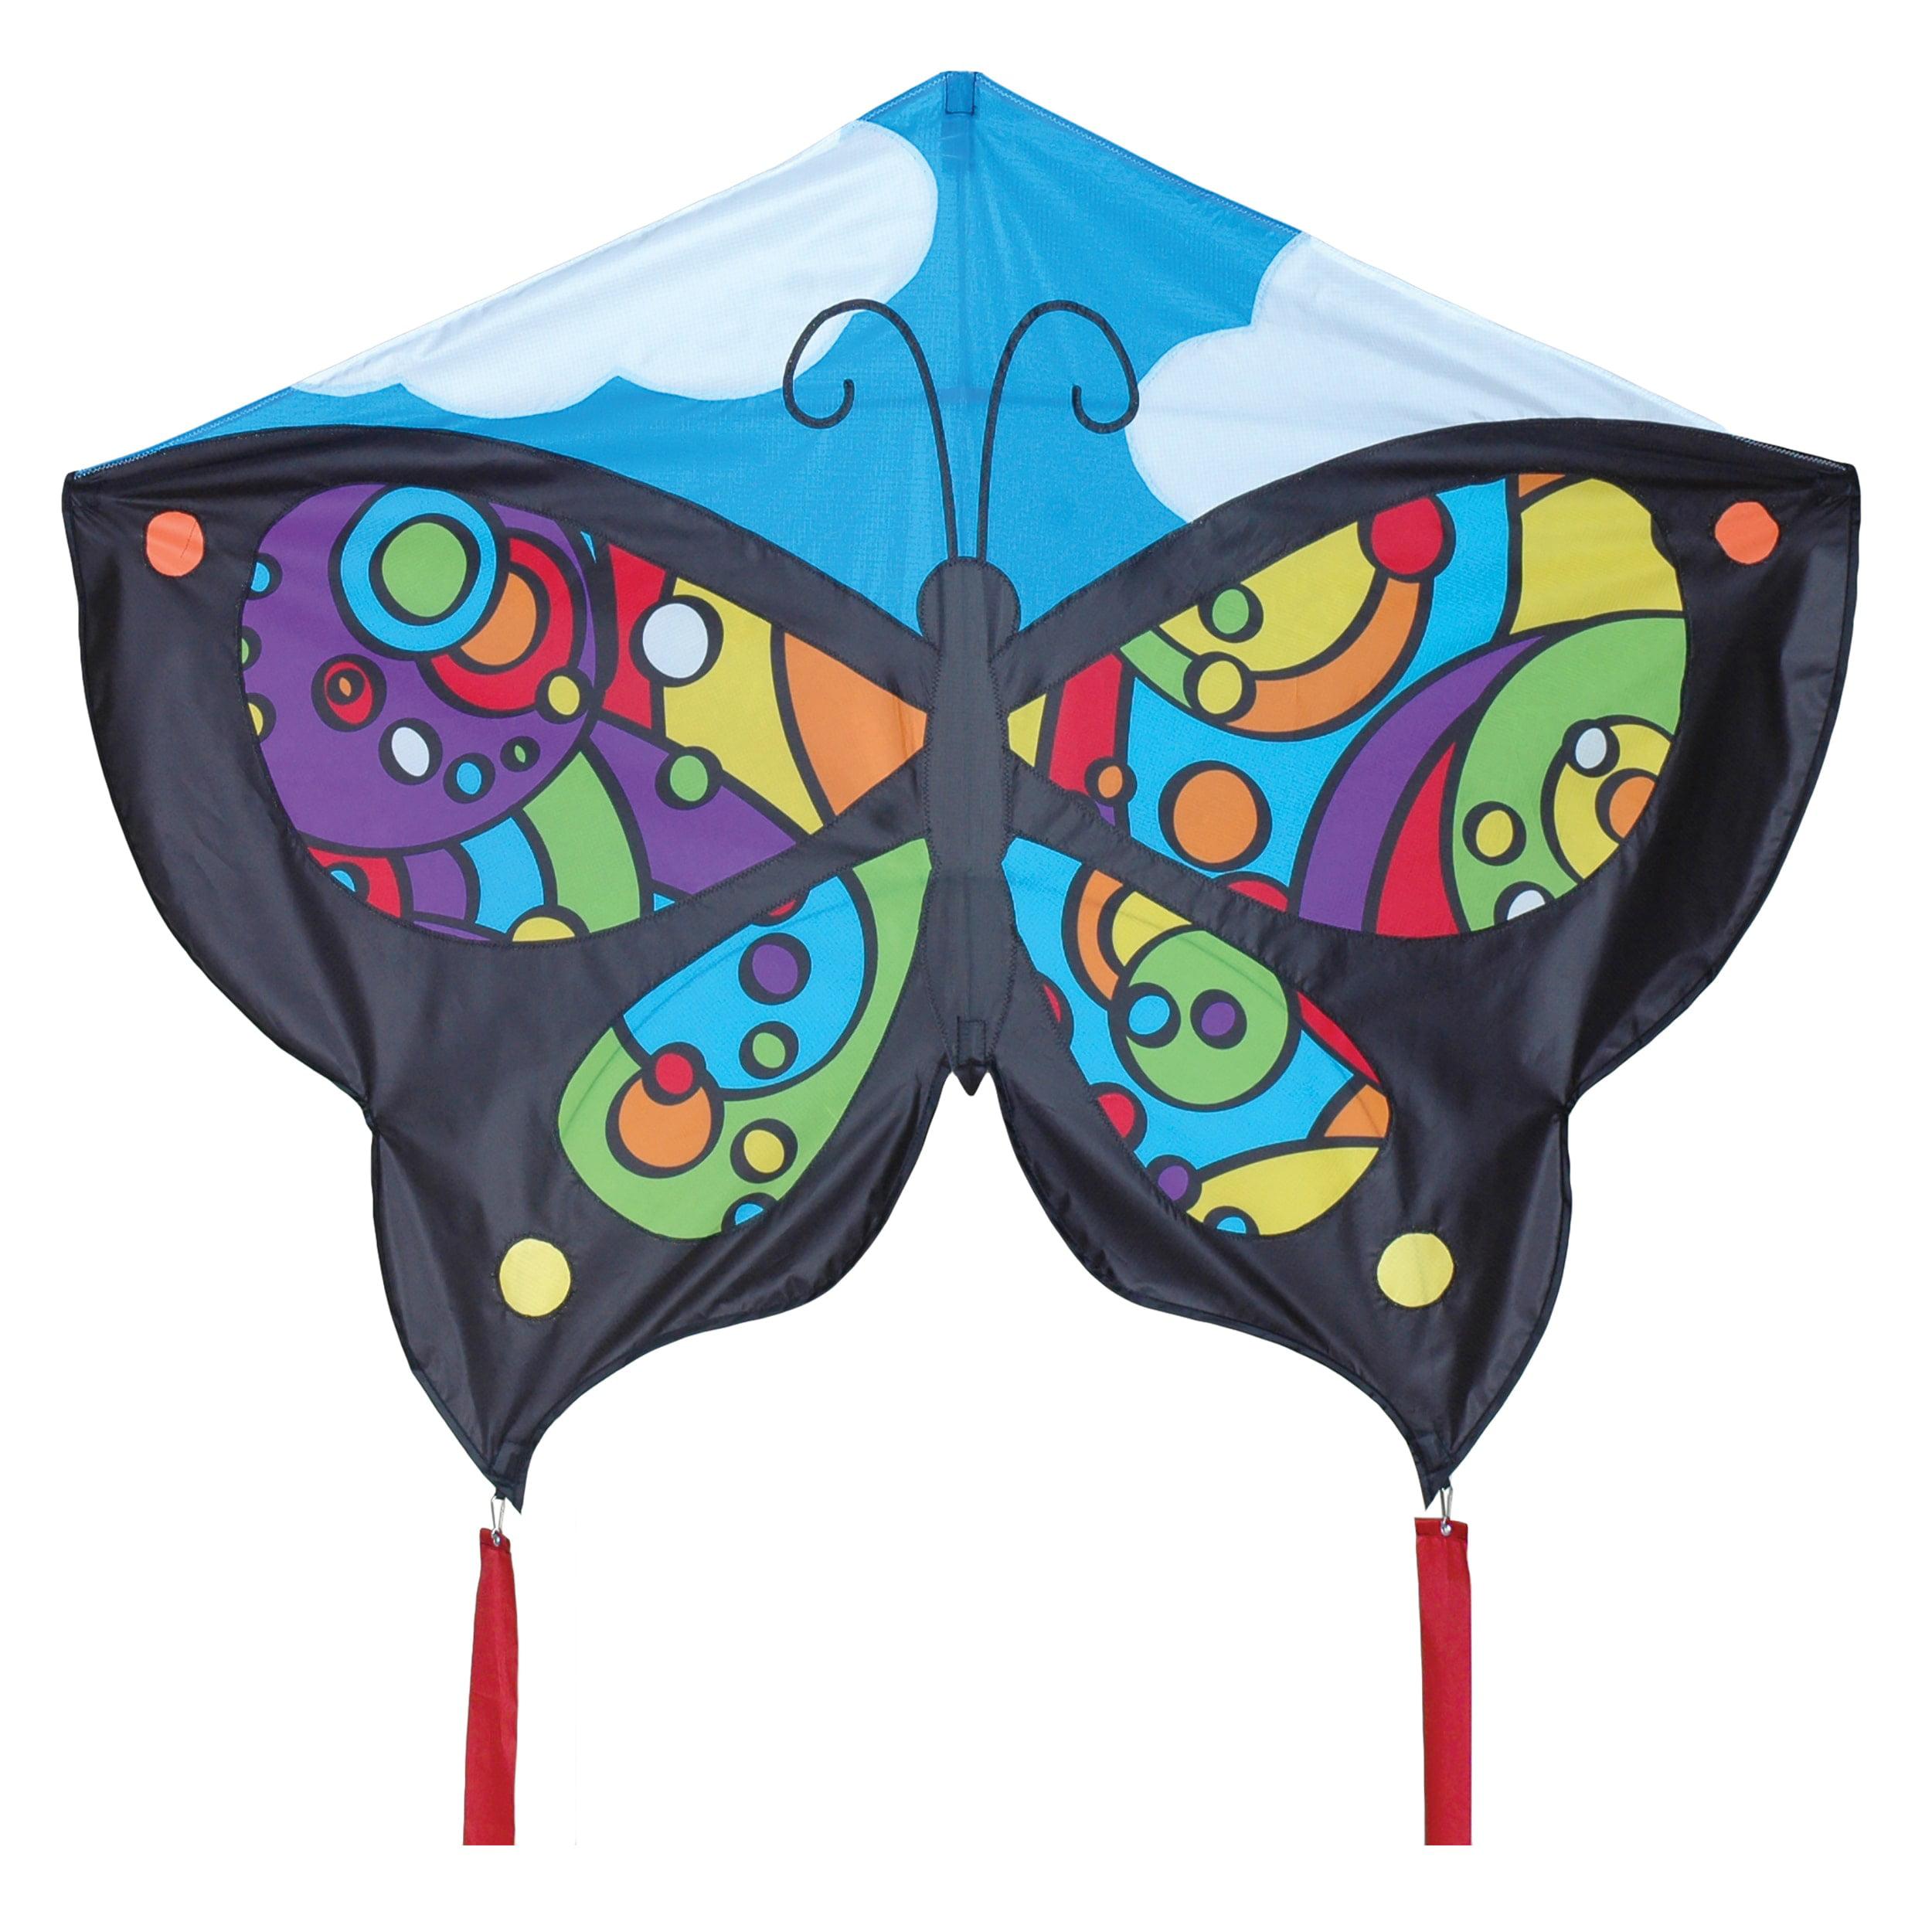 Premier Designs Butterfly Kite, RB Orbit by Premier Kite